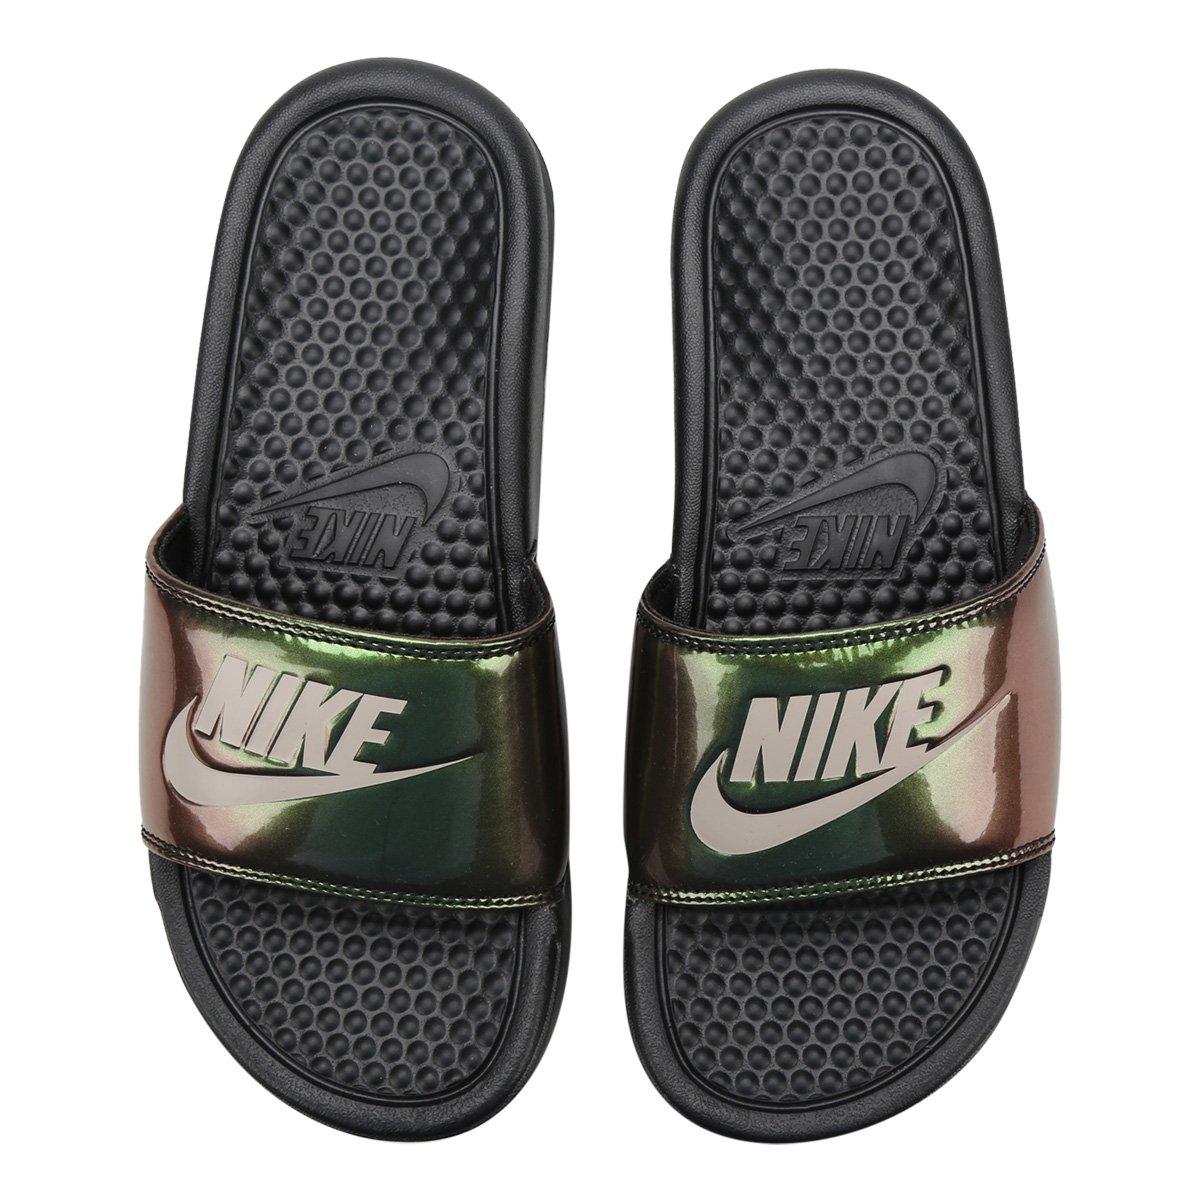 Preto Feminina Sandália Benassi Print Nike Jdi 8mNn0w